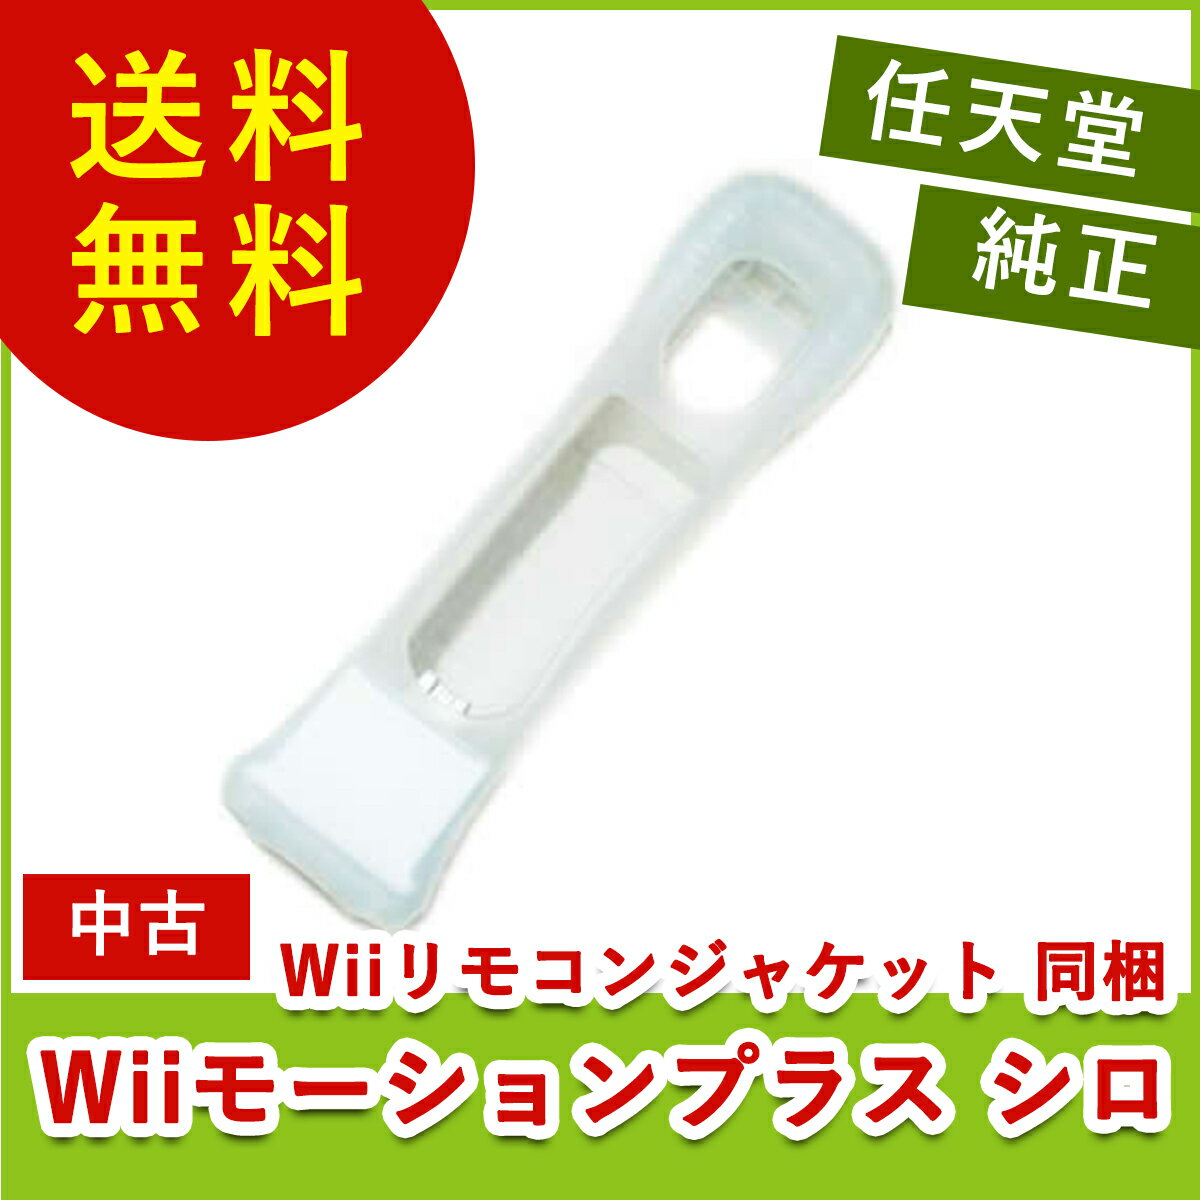 Wii ニンテンドーWii Wiiモーションプラス シロ Wiiリモコンジャケット同梱 リモコンジャケット付き 任天堂 中古 4902370517583 送料無料 【中古】